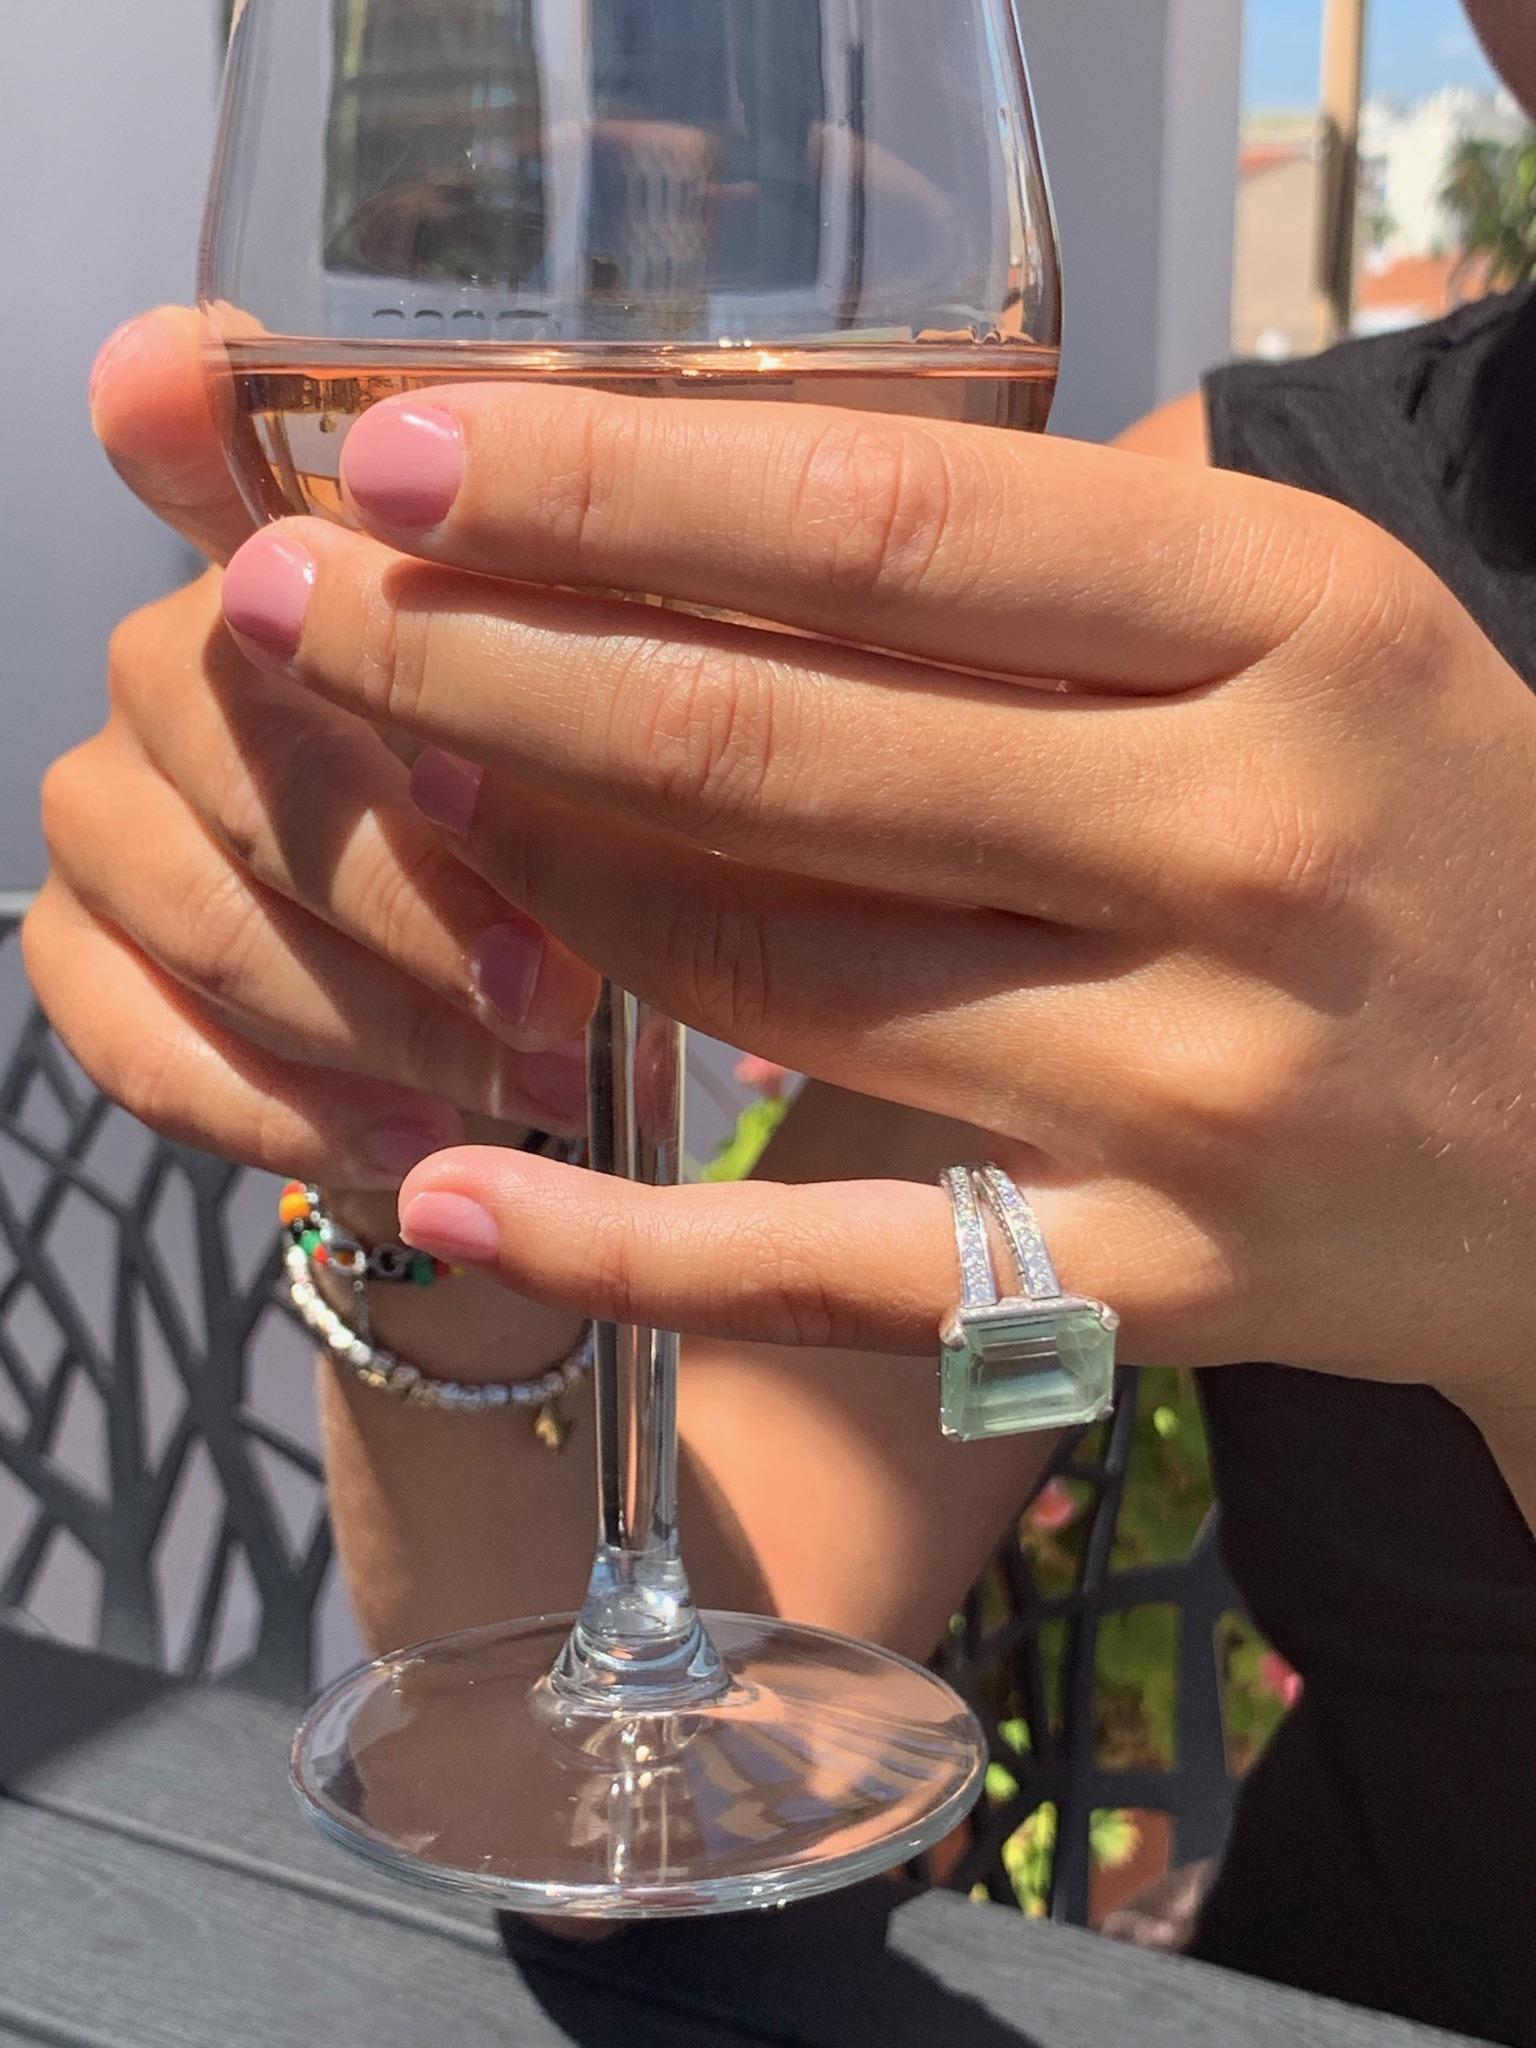 10 carat untreated aquamarine with diamonds in white gold